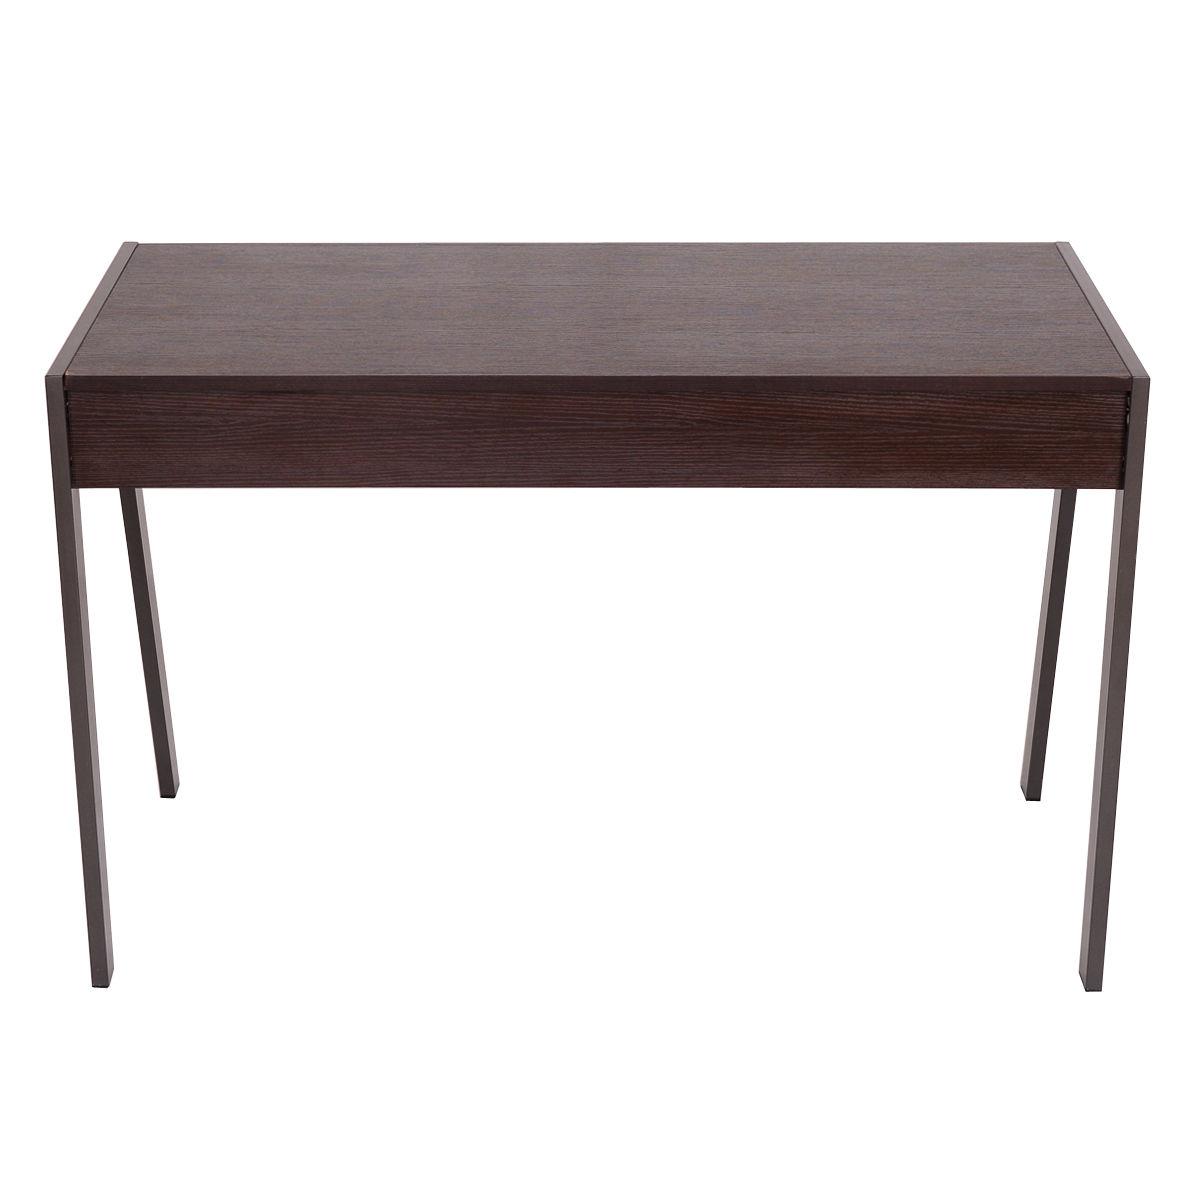 Wood Top Metal Frame Computer Desk